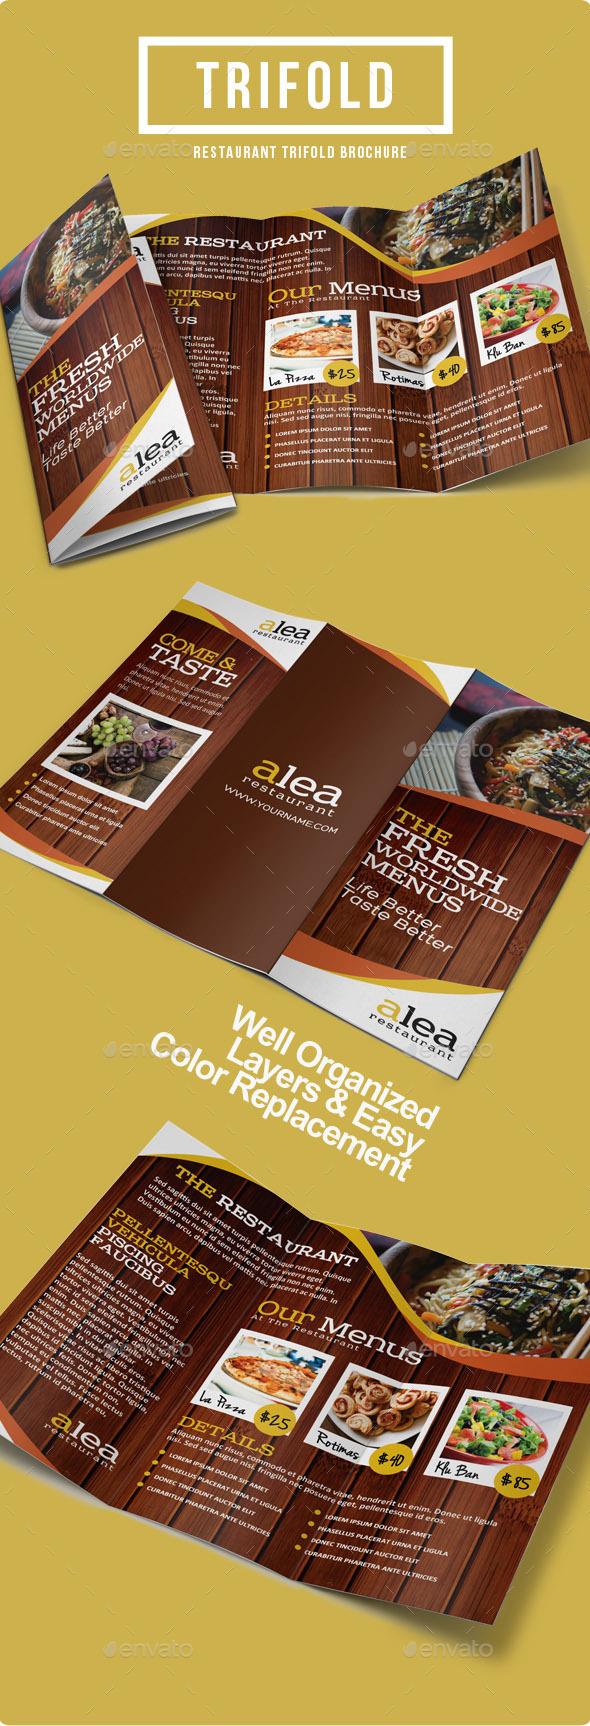 Alea Restaurant Trifold Brochure - Informational Brochures